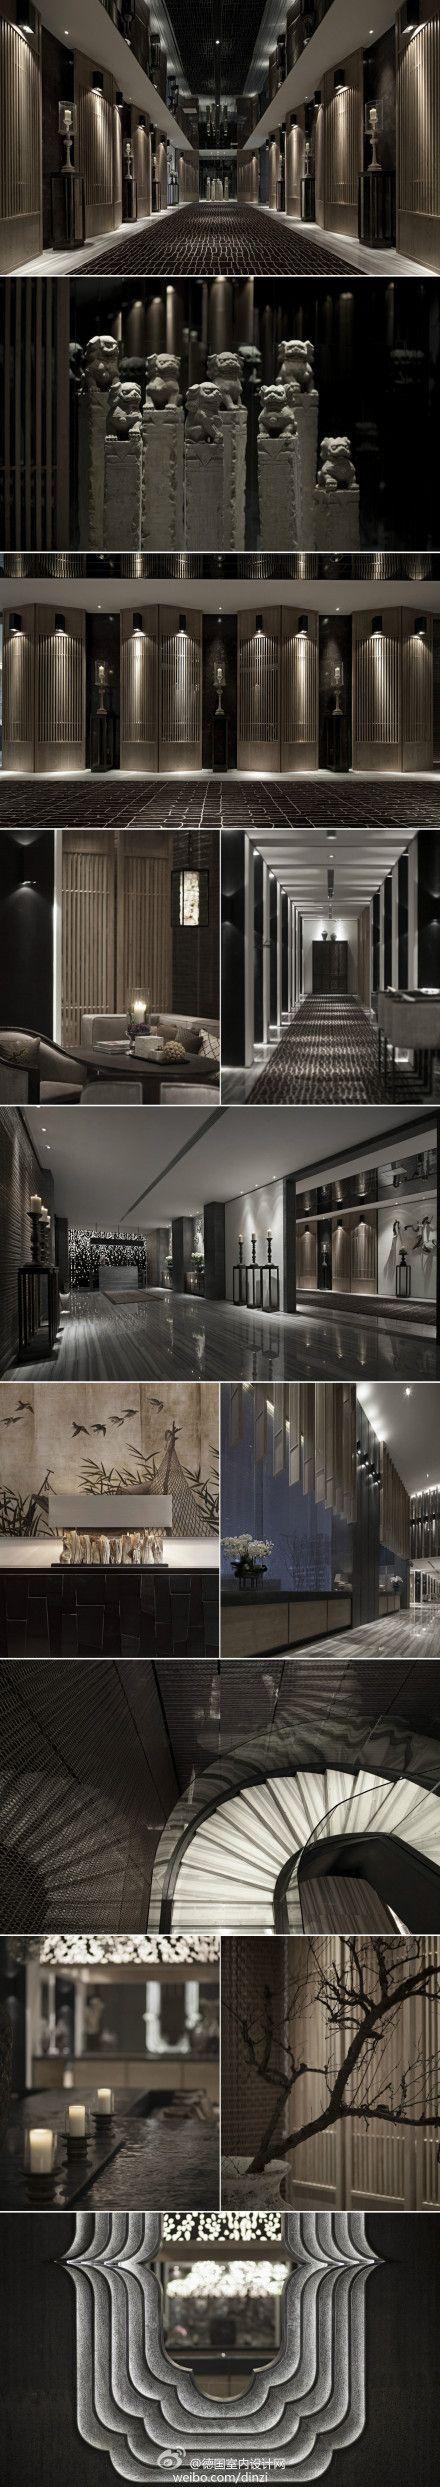 best 新中式 images on pinterest